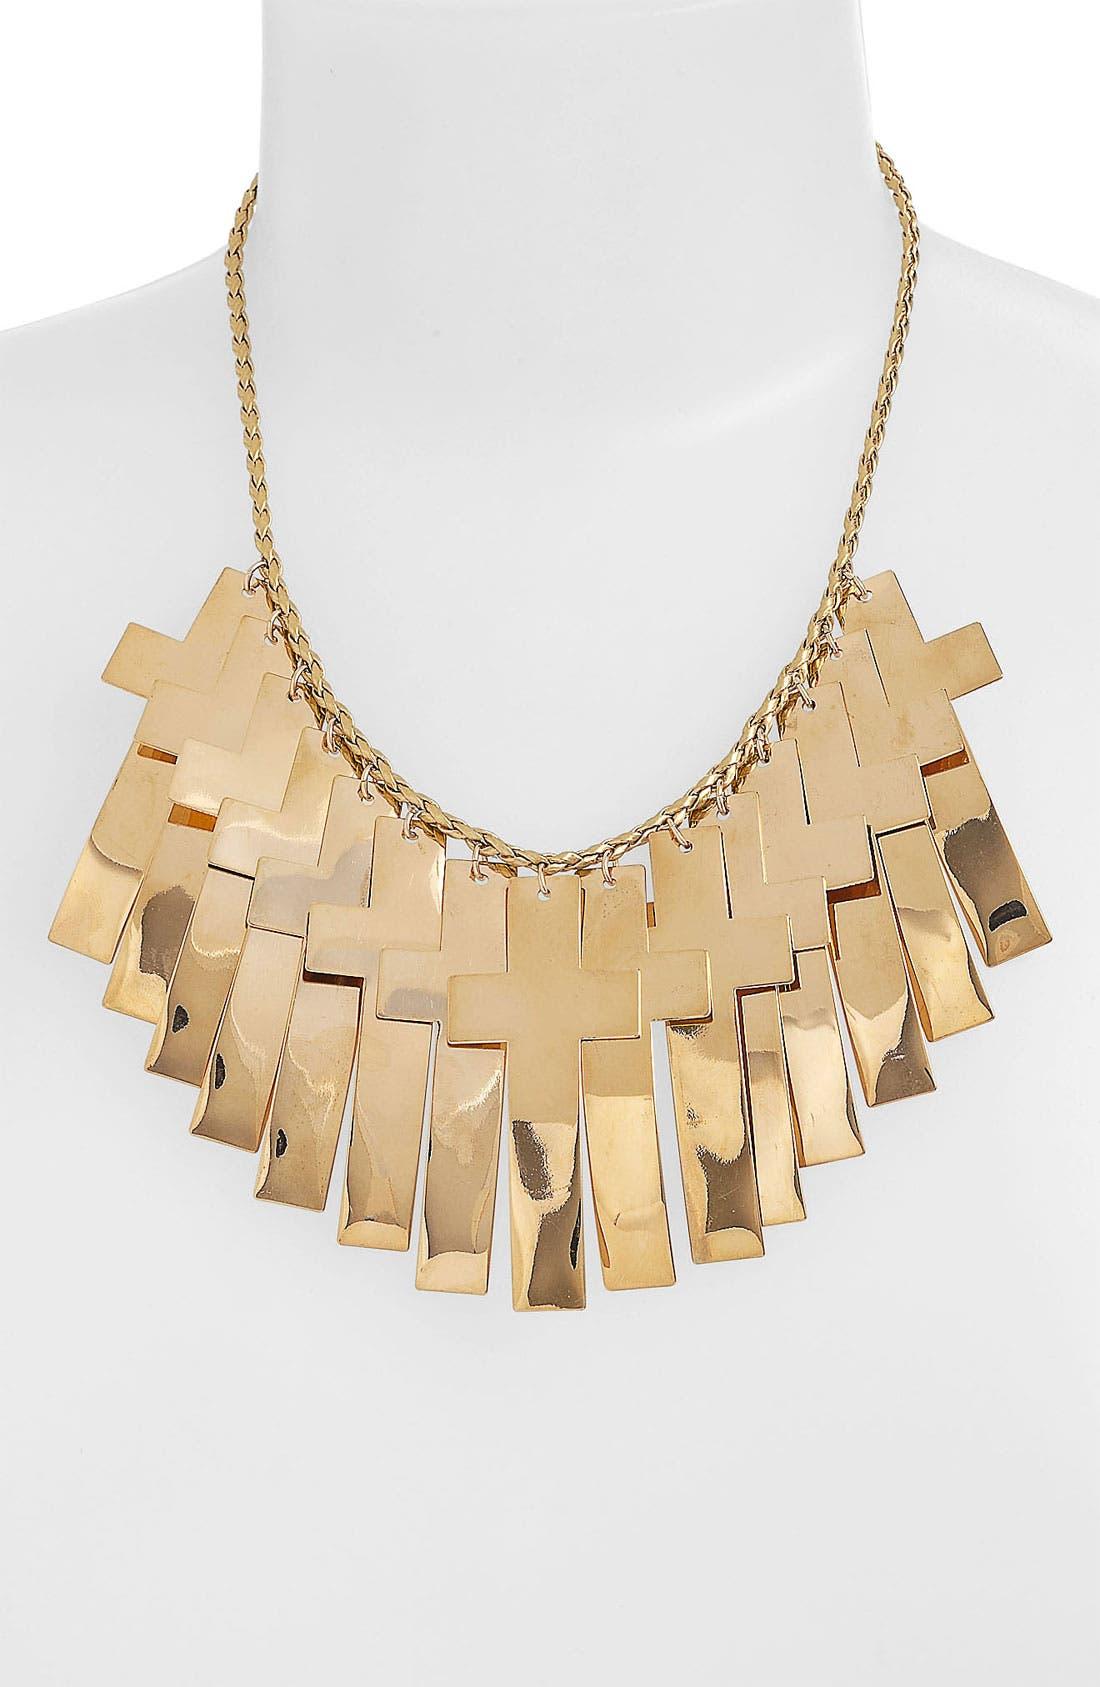 Main Image - Belle Noel 'Empyrean' Statement Necklace